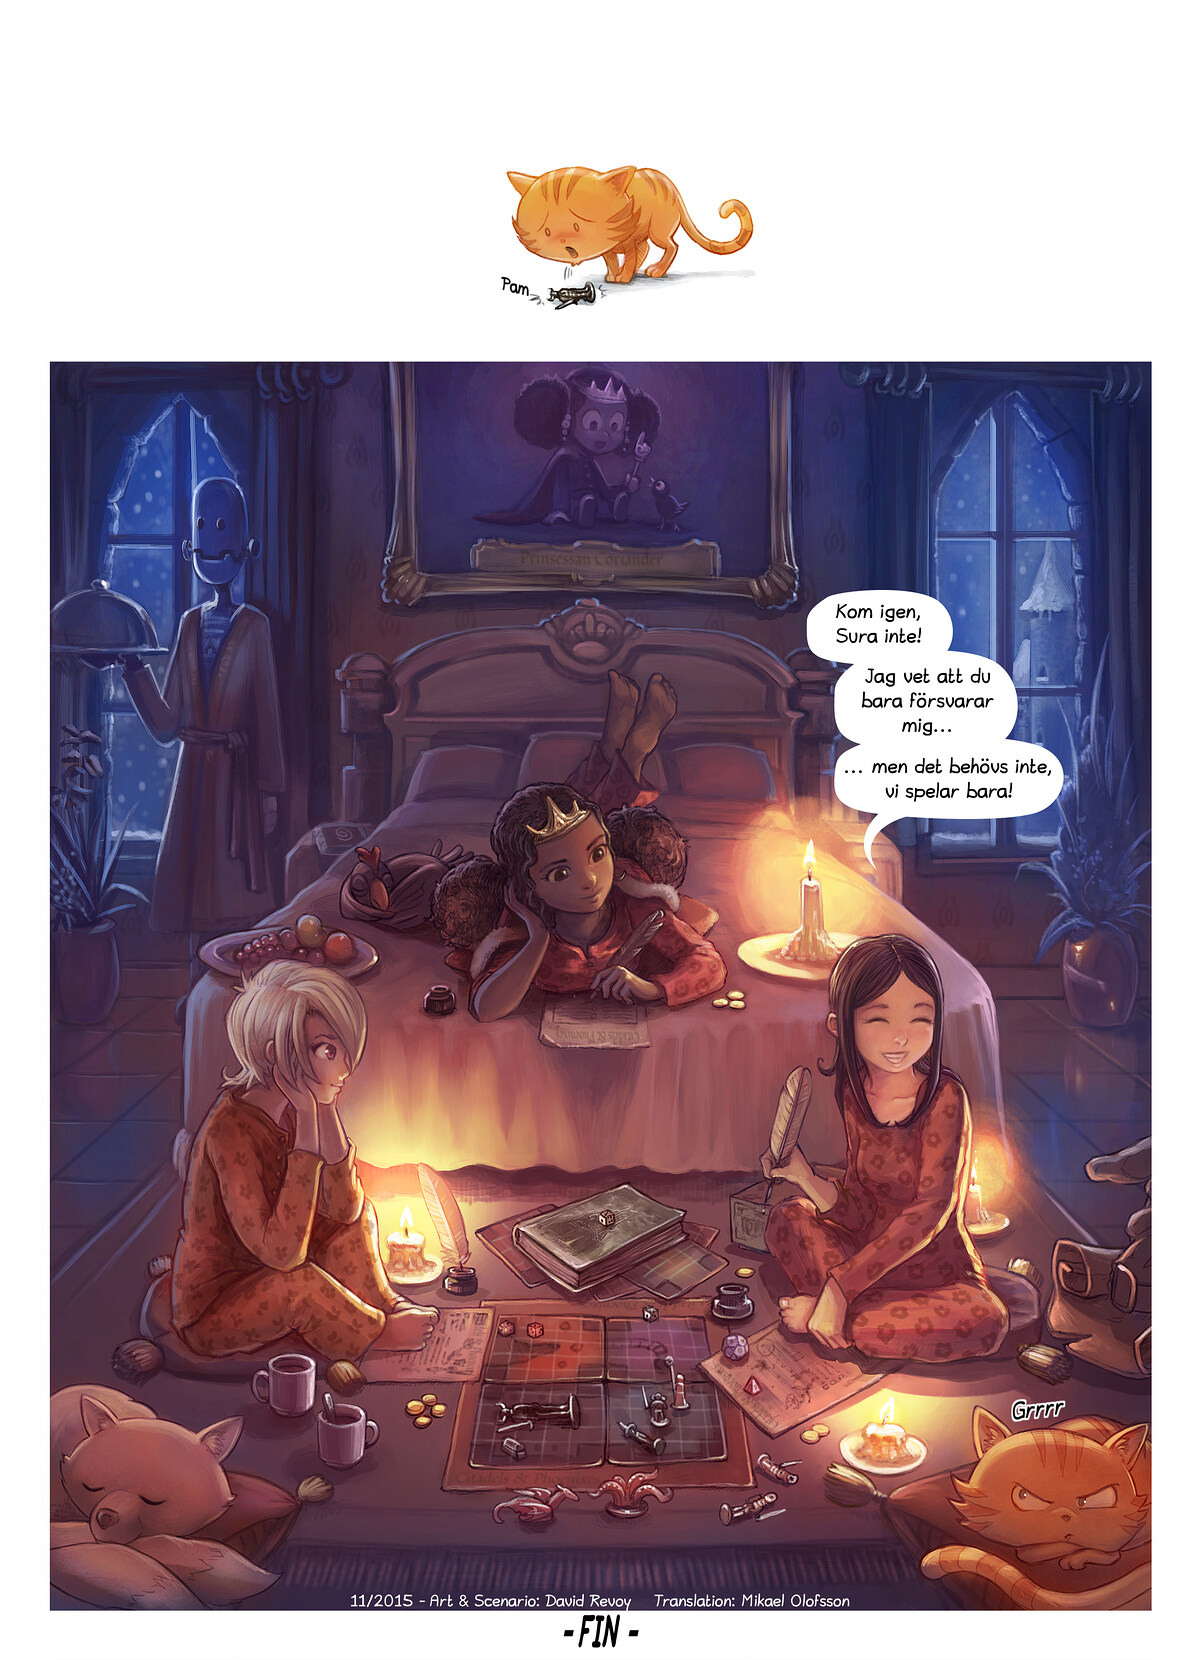 Episode 13: Pyjamasparty, Page 6